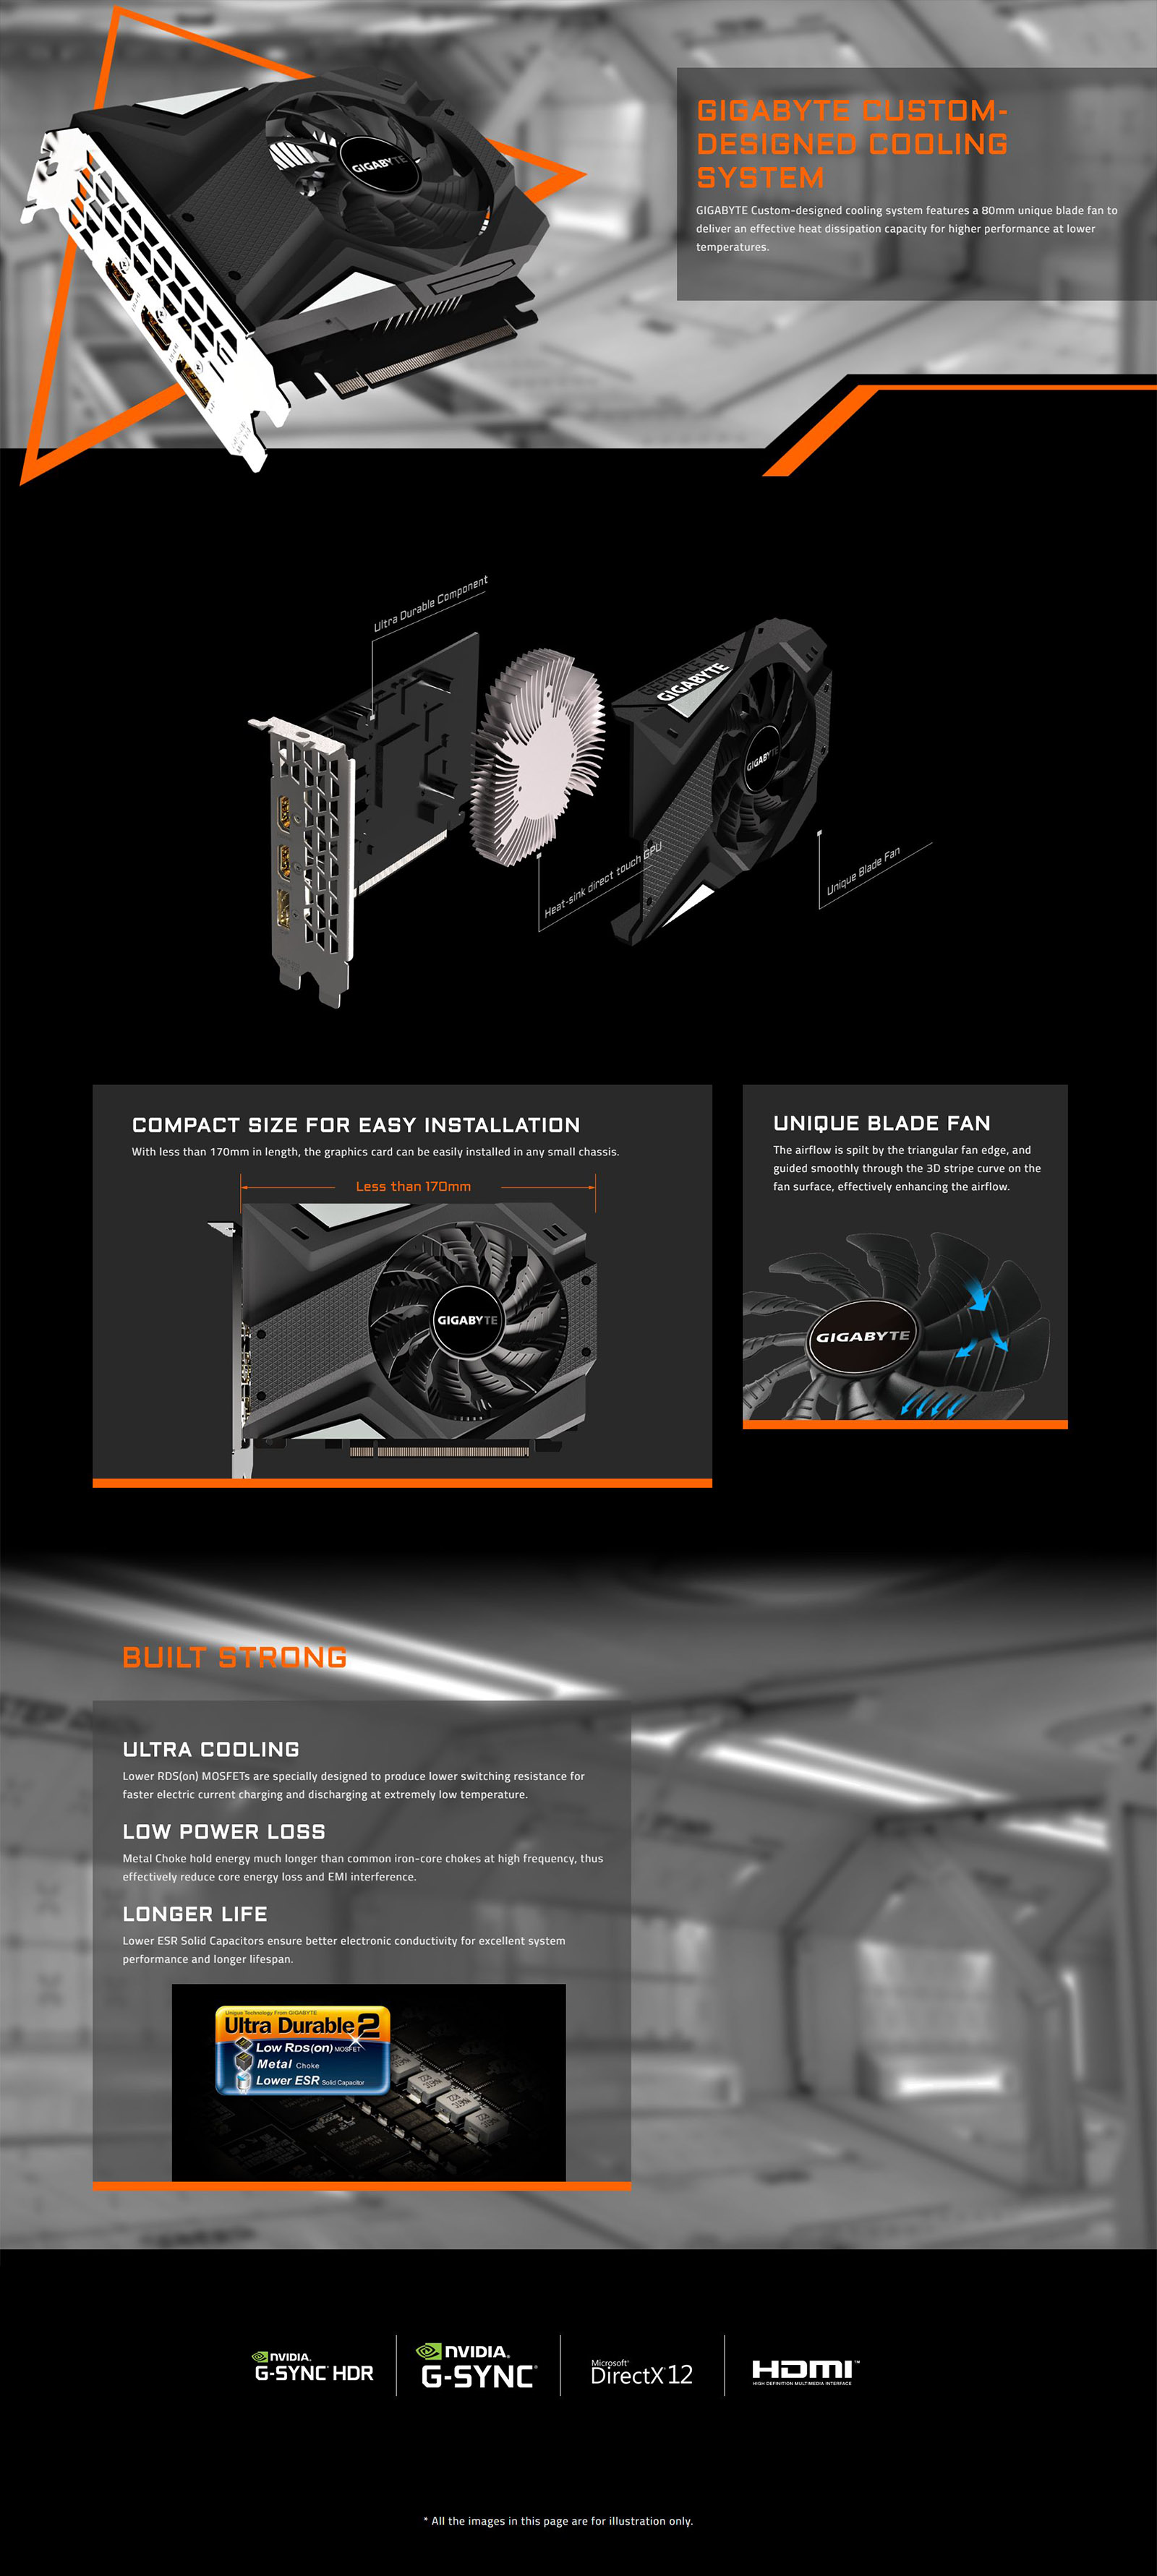 Gigabyte GeForce GTX 1650 Mini ITX 4G OC Graphics Card